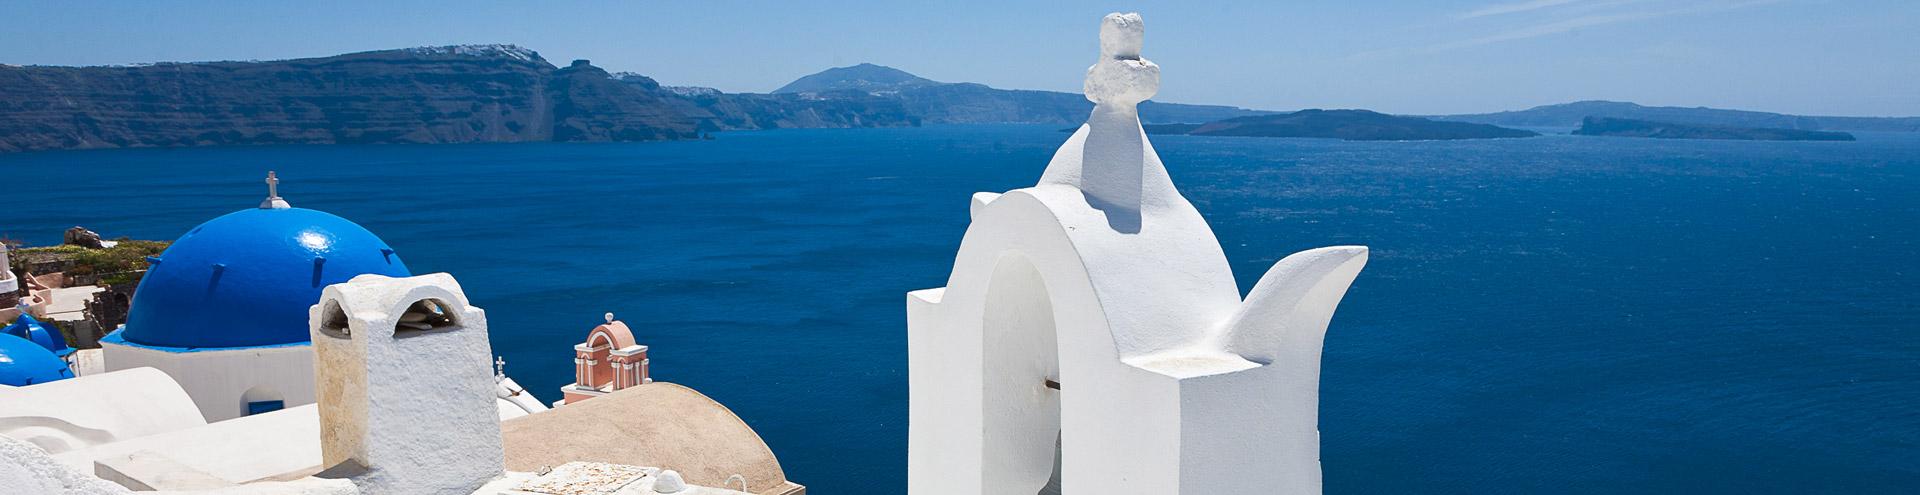 Fotoinsel Santorin